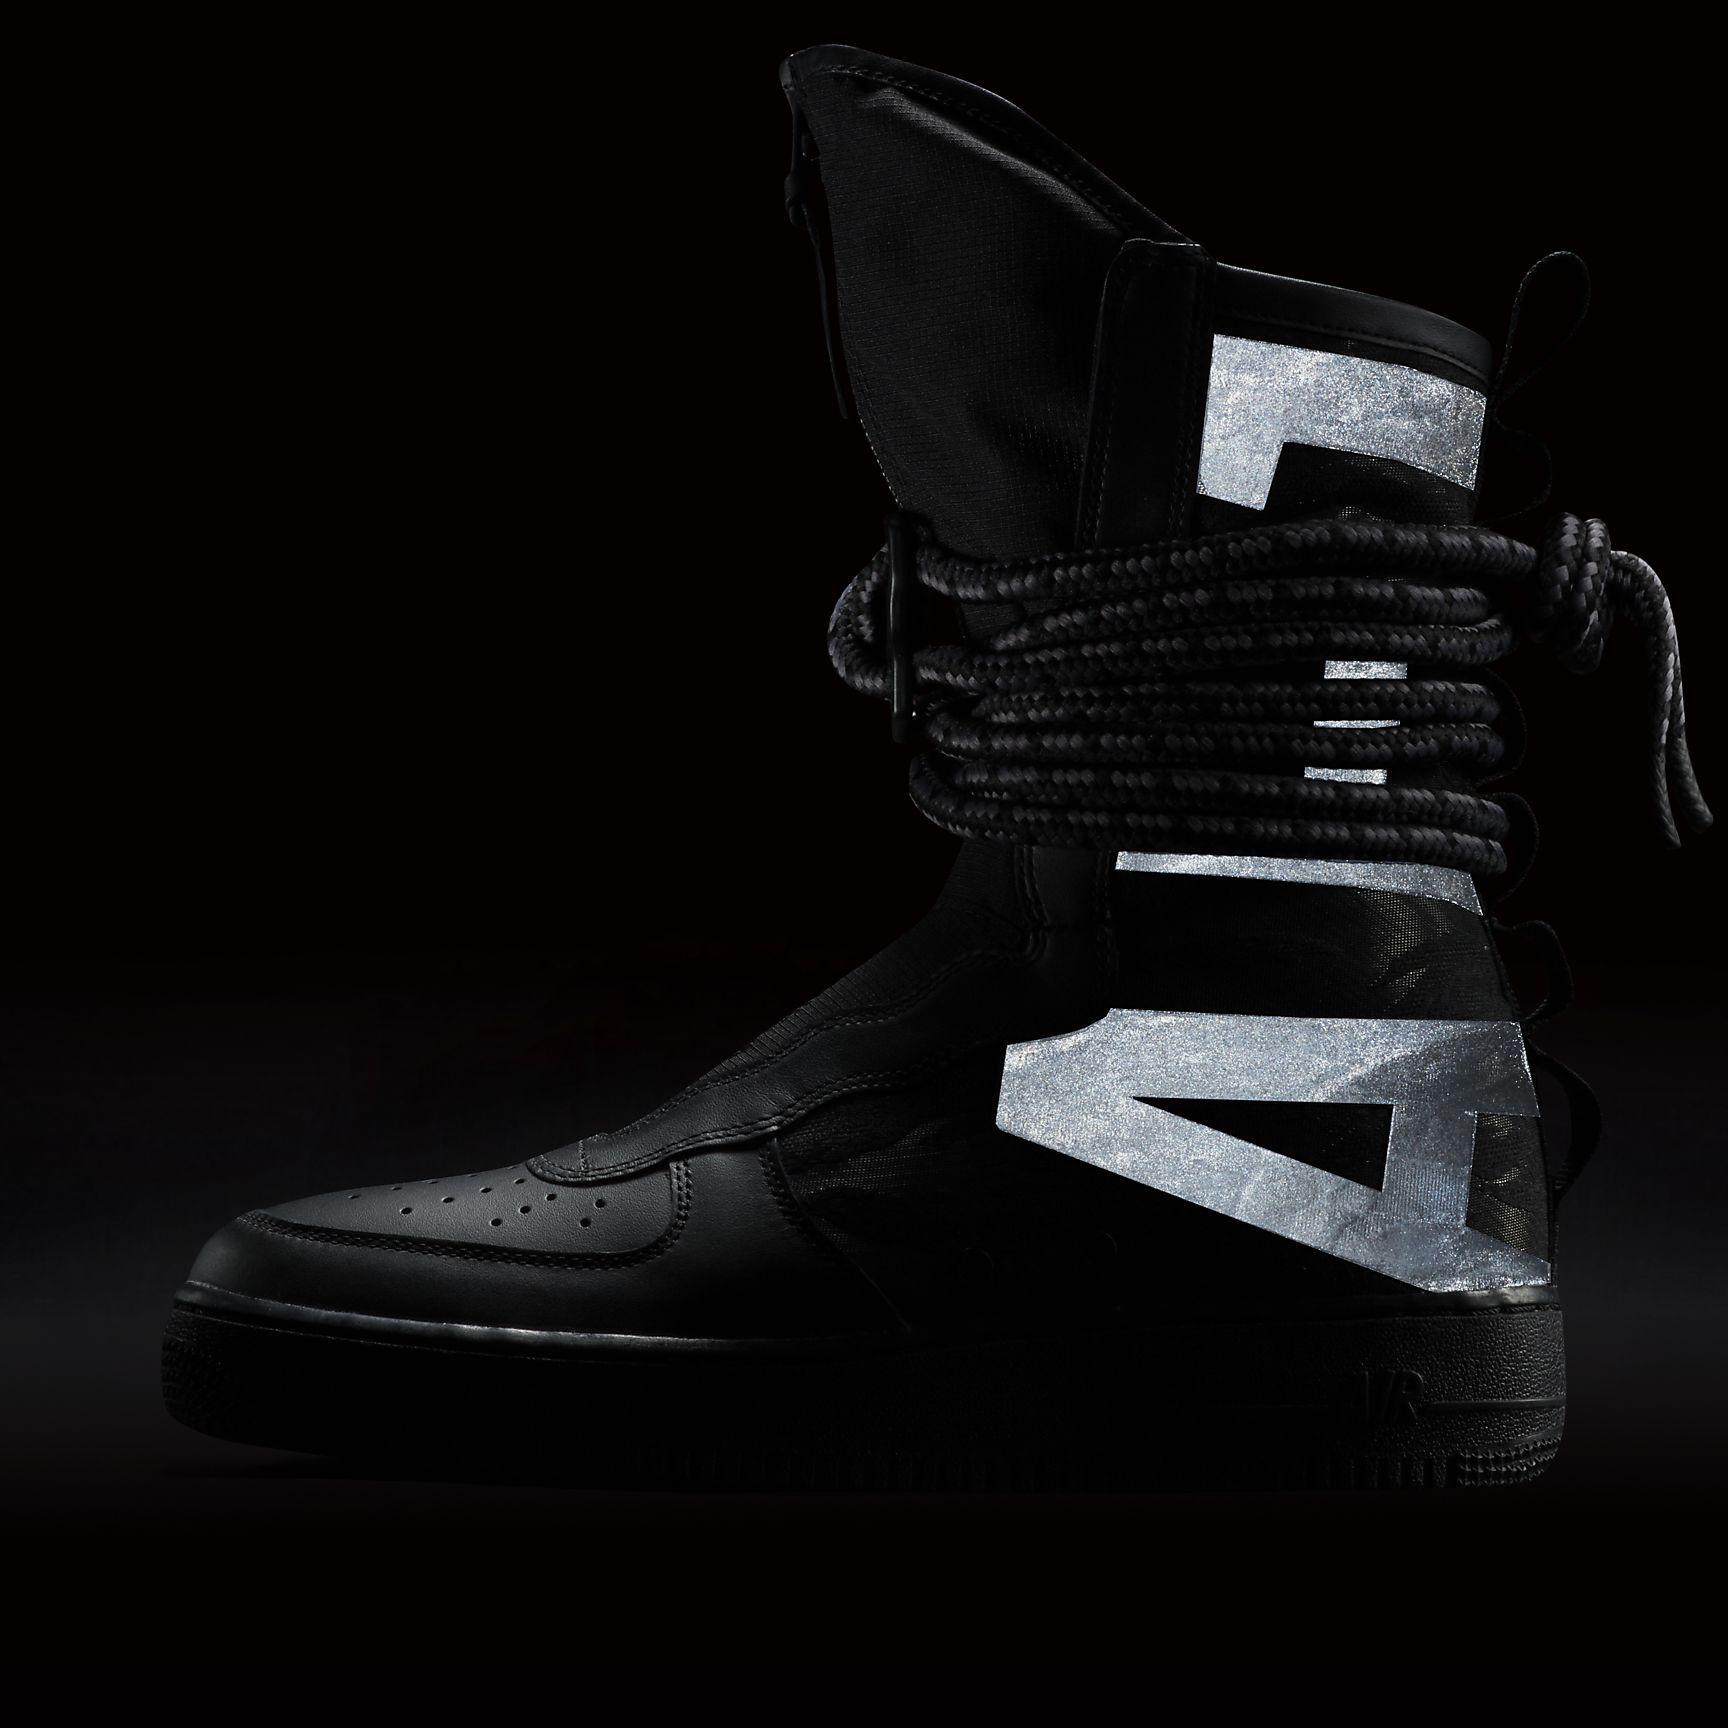 Pin von Claudi auf Schuhe | Schuhe